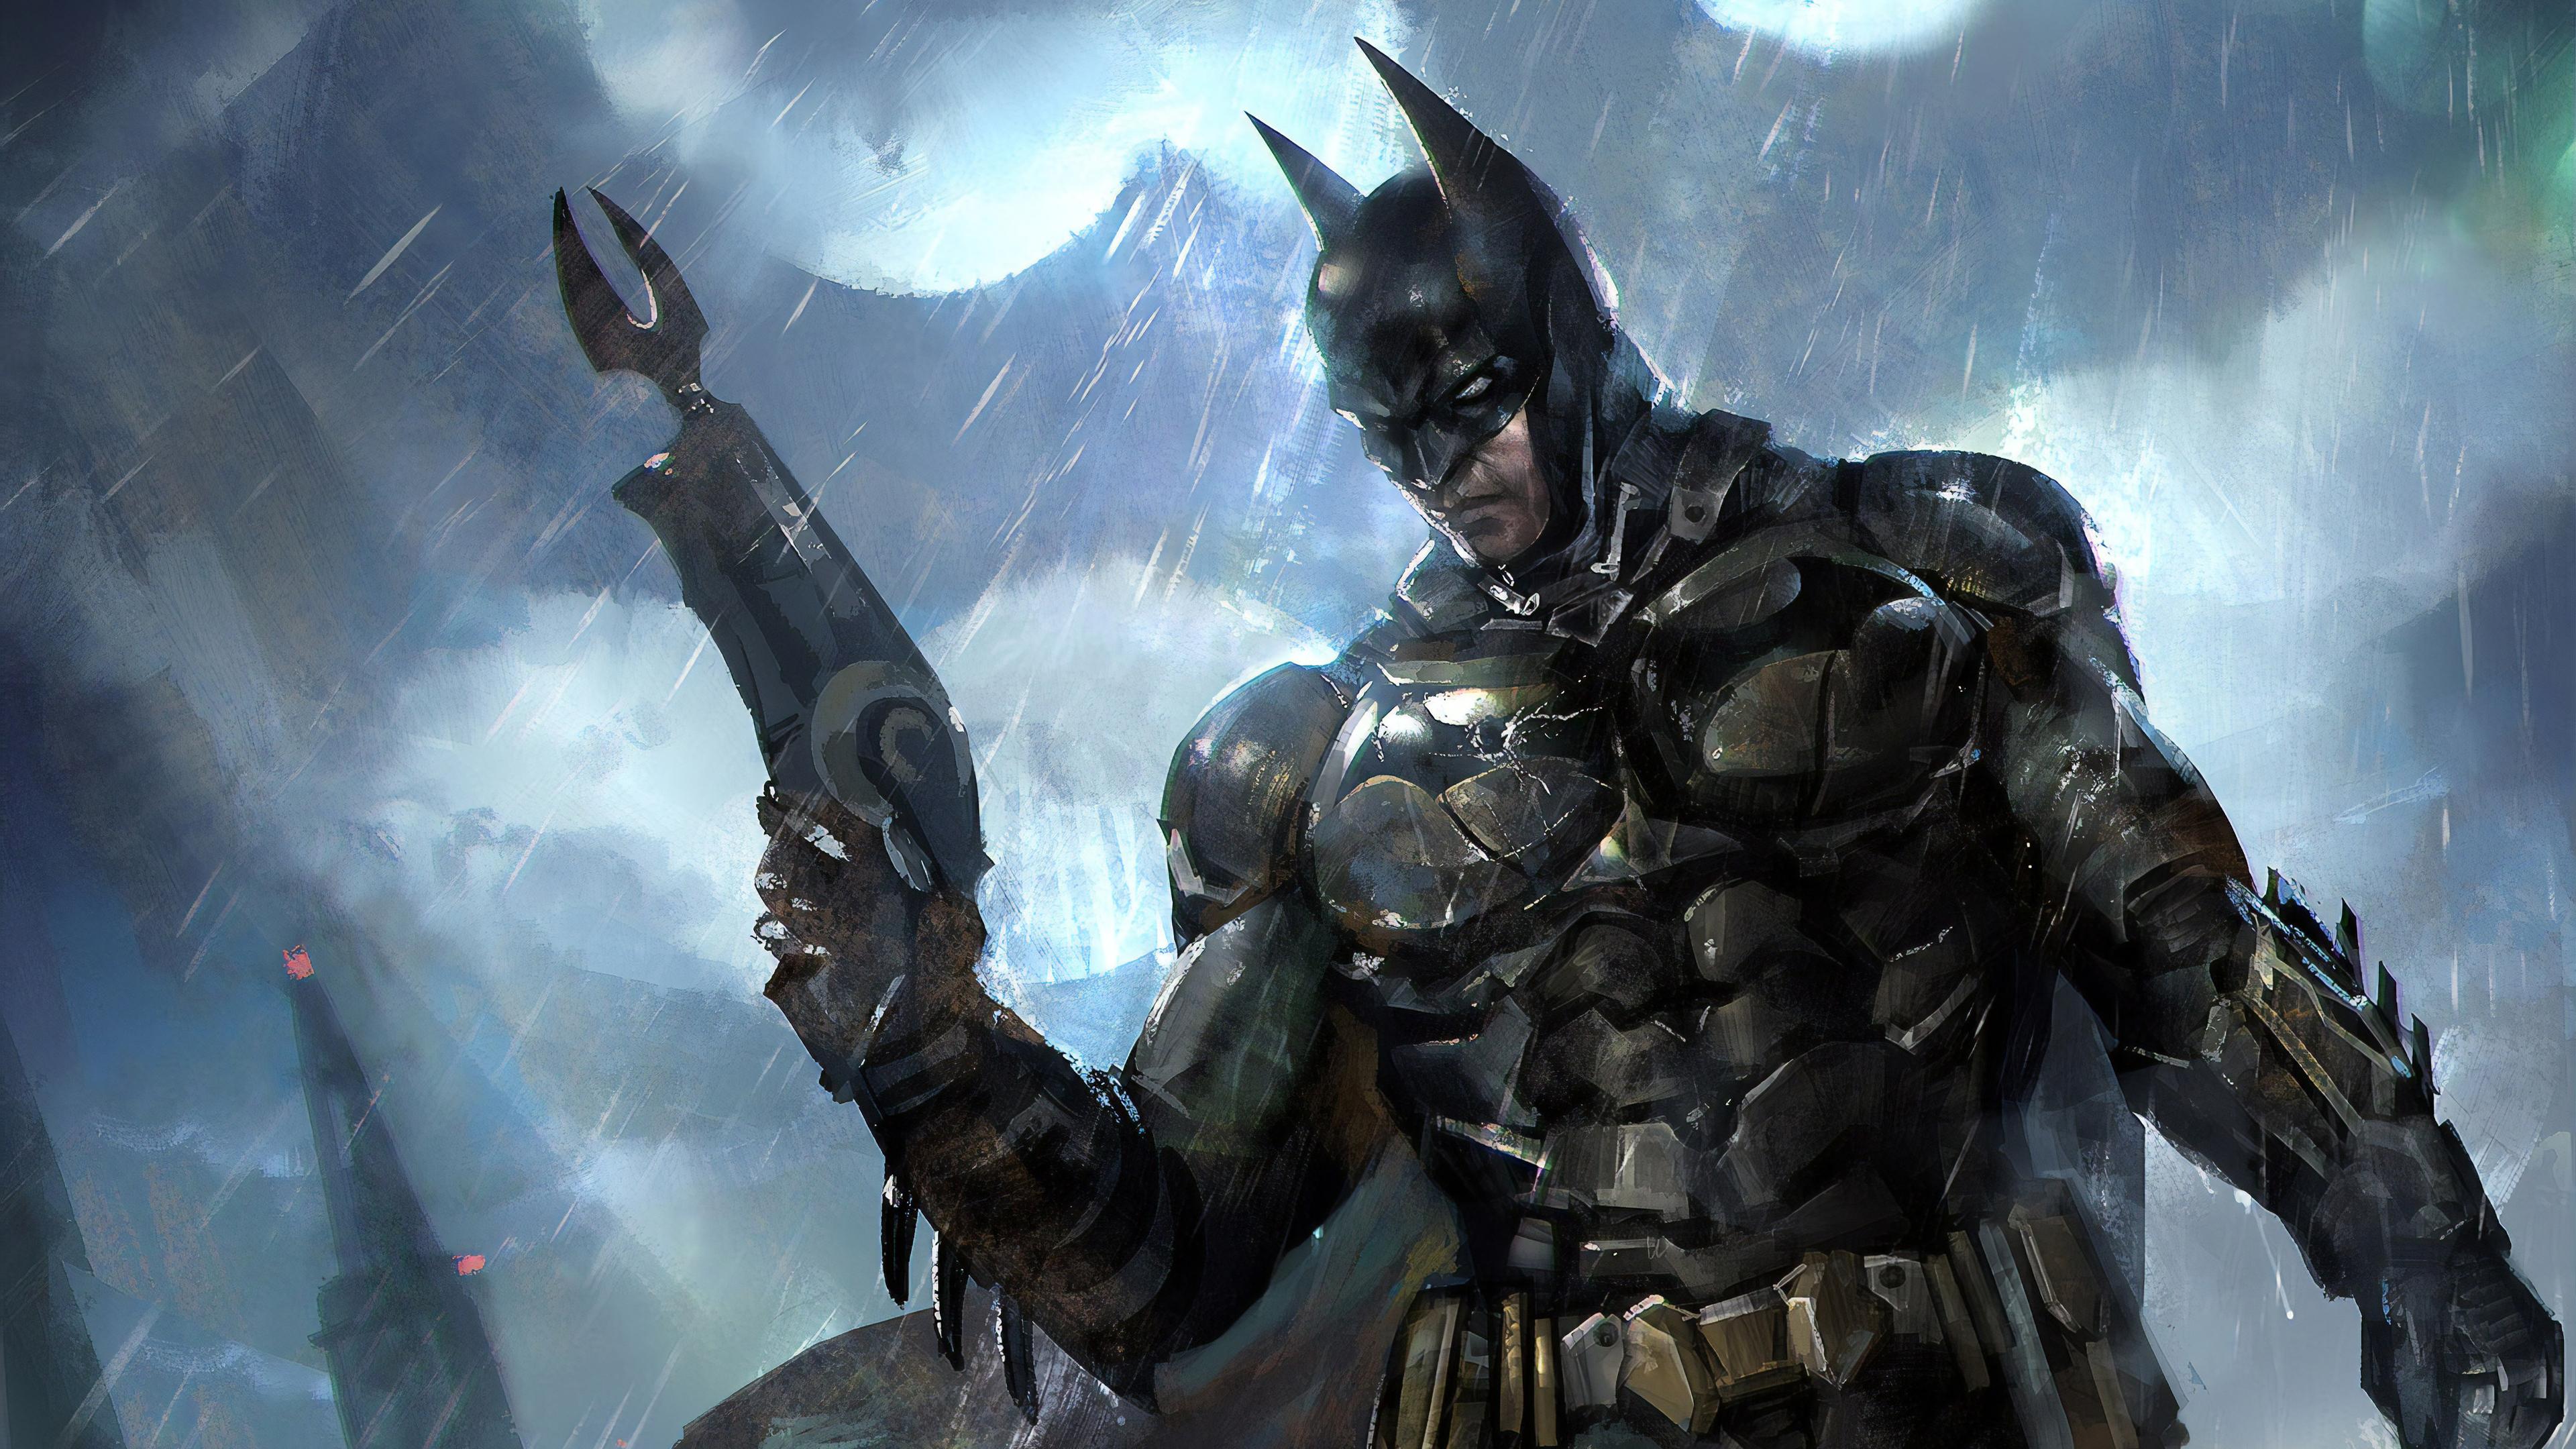 4k batman knight 1559764219 - 4k Batman Knight - superheroes wallpapers, hd-wallpapers, digital art wallpapers, behance wallpapers, batman wallpapers, artwork wallpapers, 4k-wallpapers